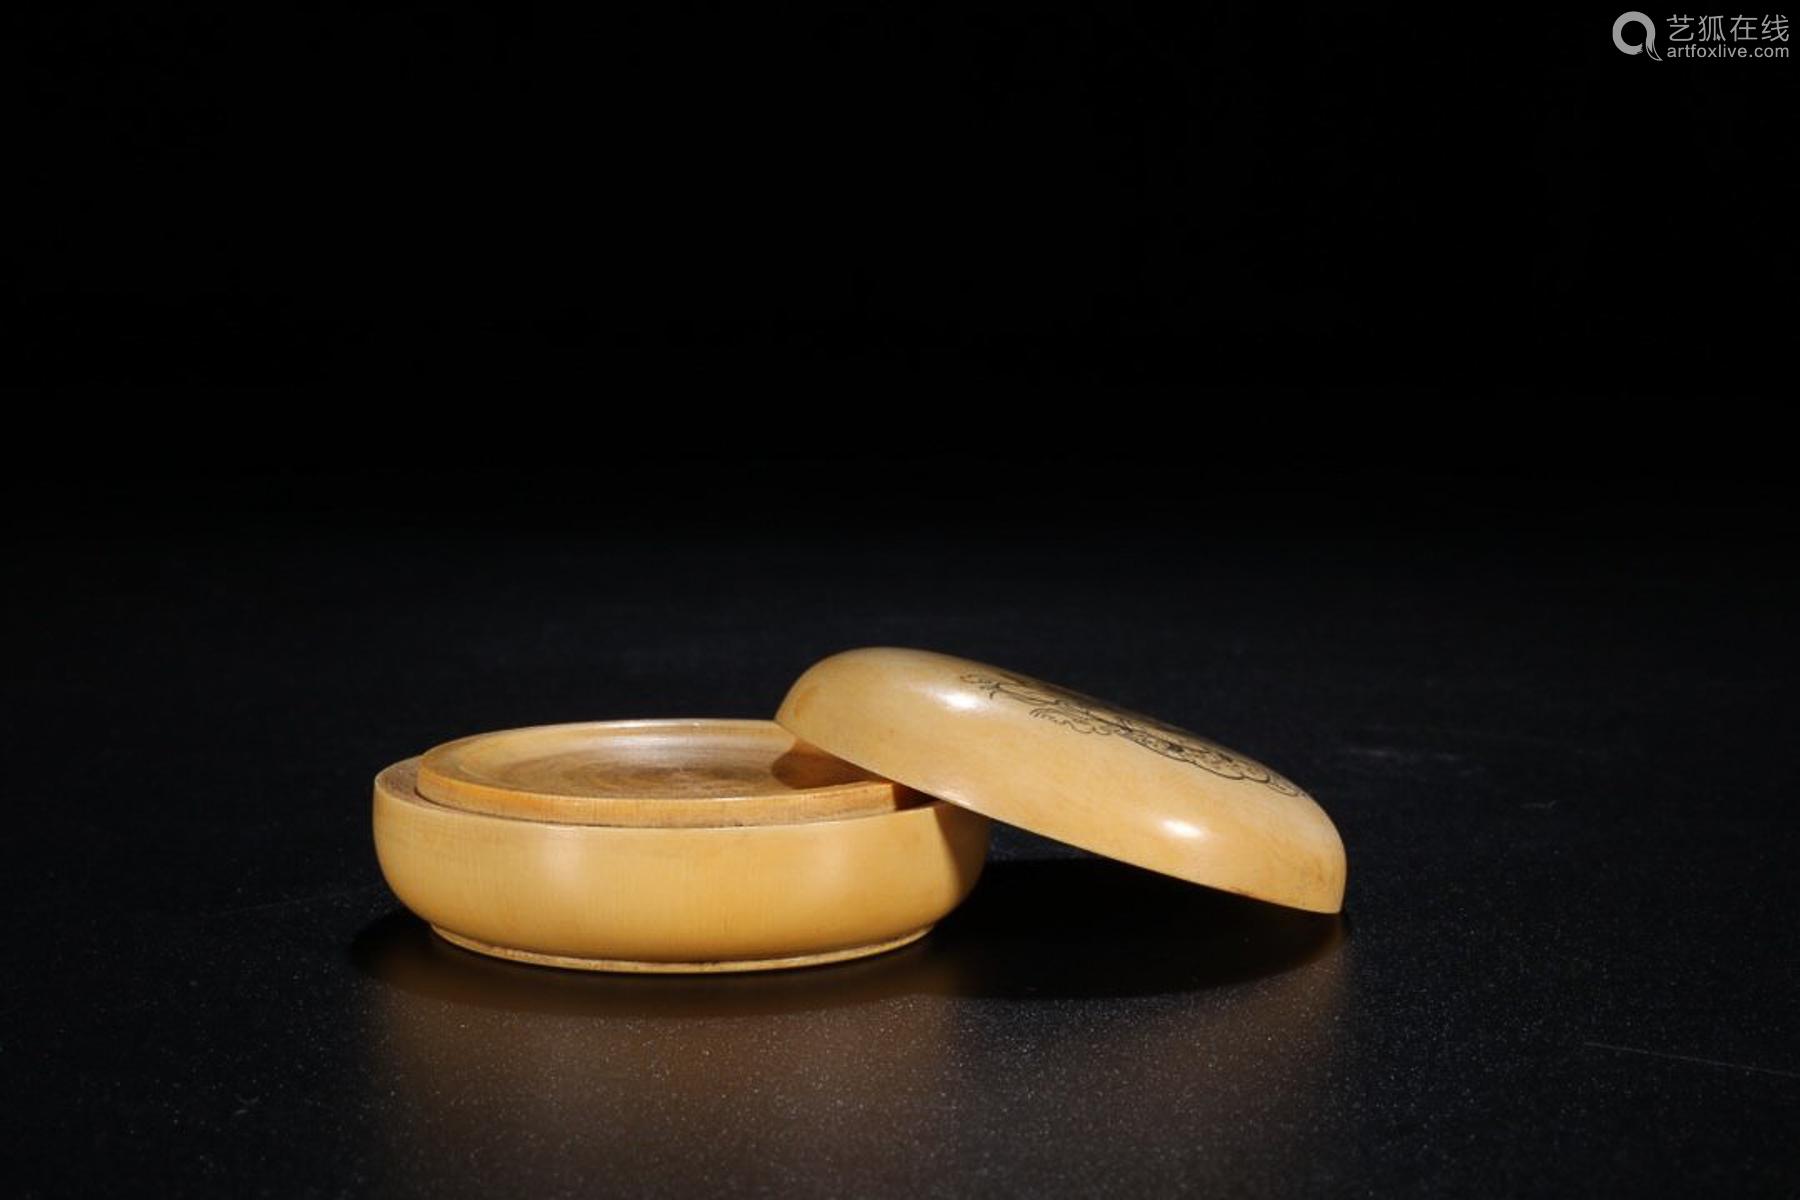 QIANLONG MARK RARE MATERIAL GUANYIN CAPPING BOX